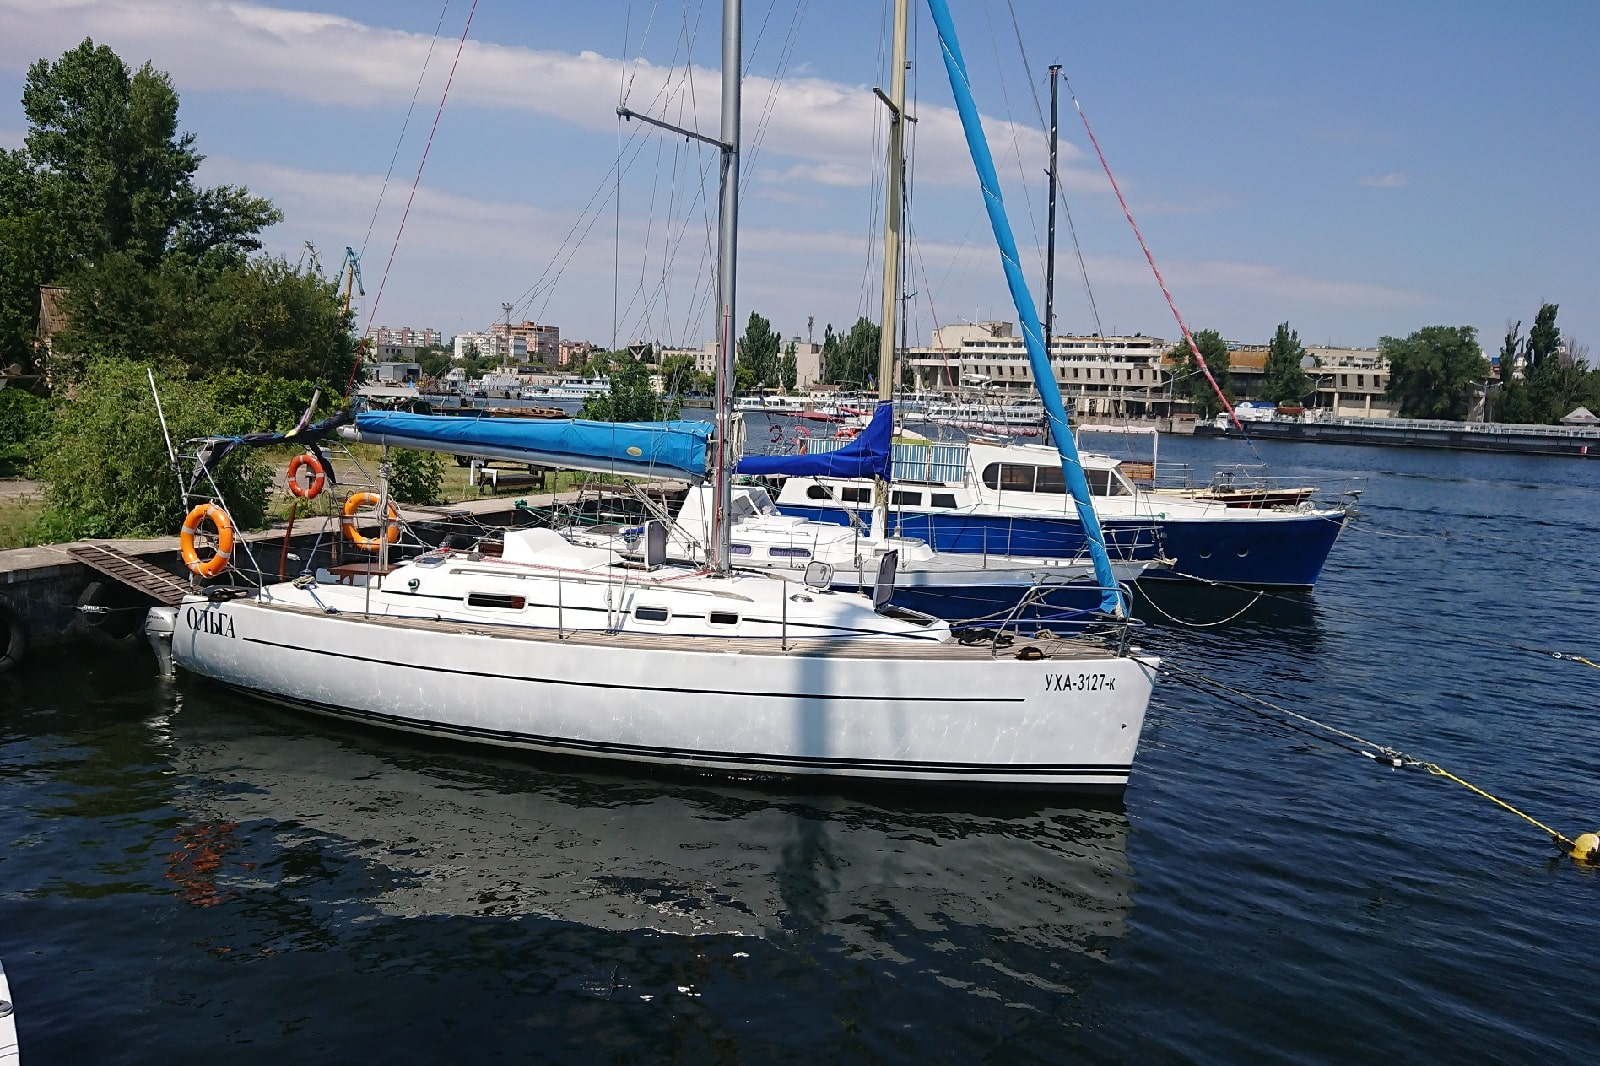 Яхта на стоянке